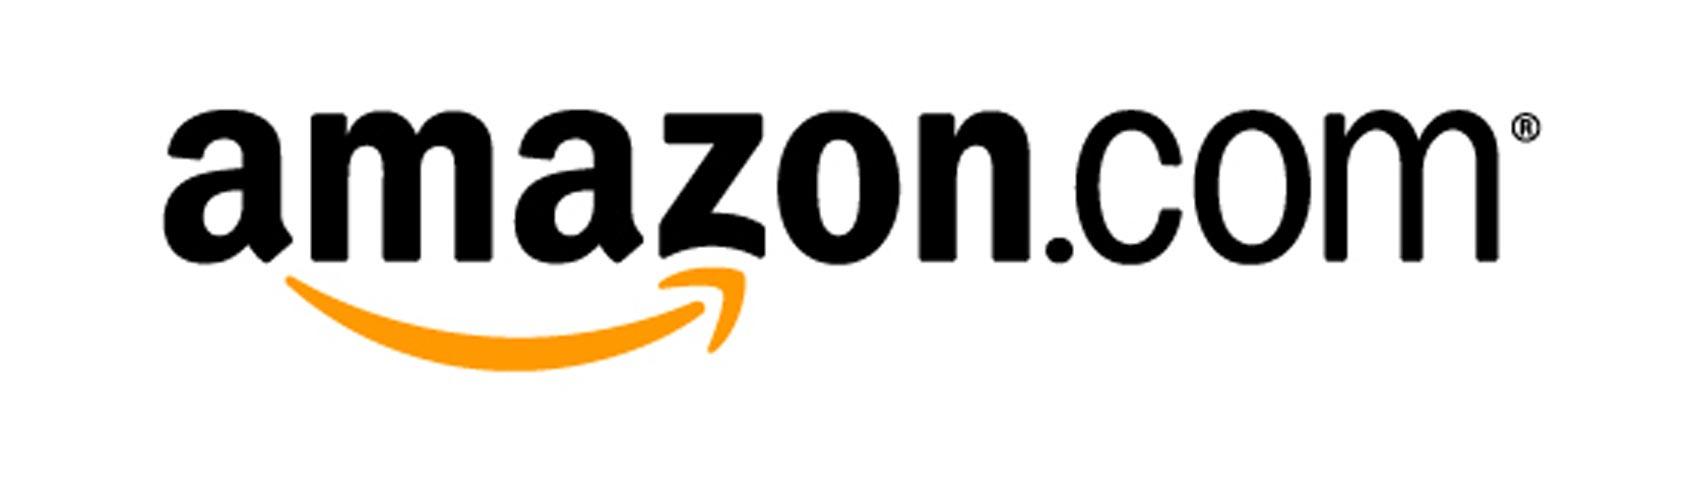 Review Amazon Gift Card, Voucher Belanja Untuk Belanja di Amazon.com